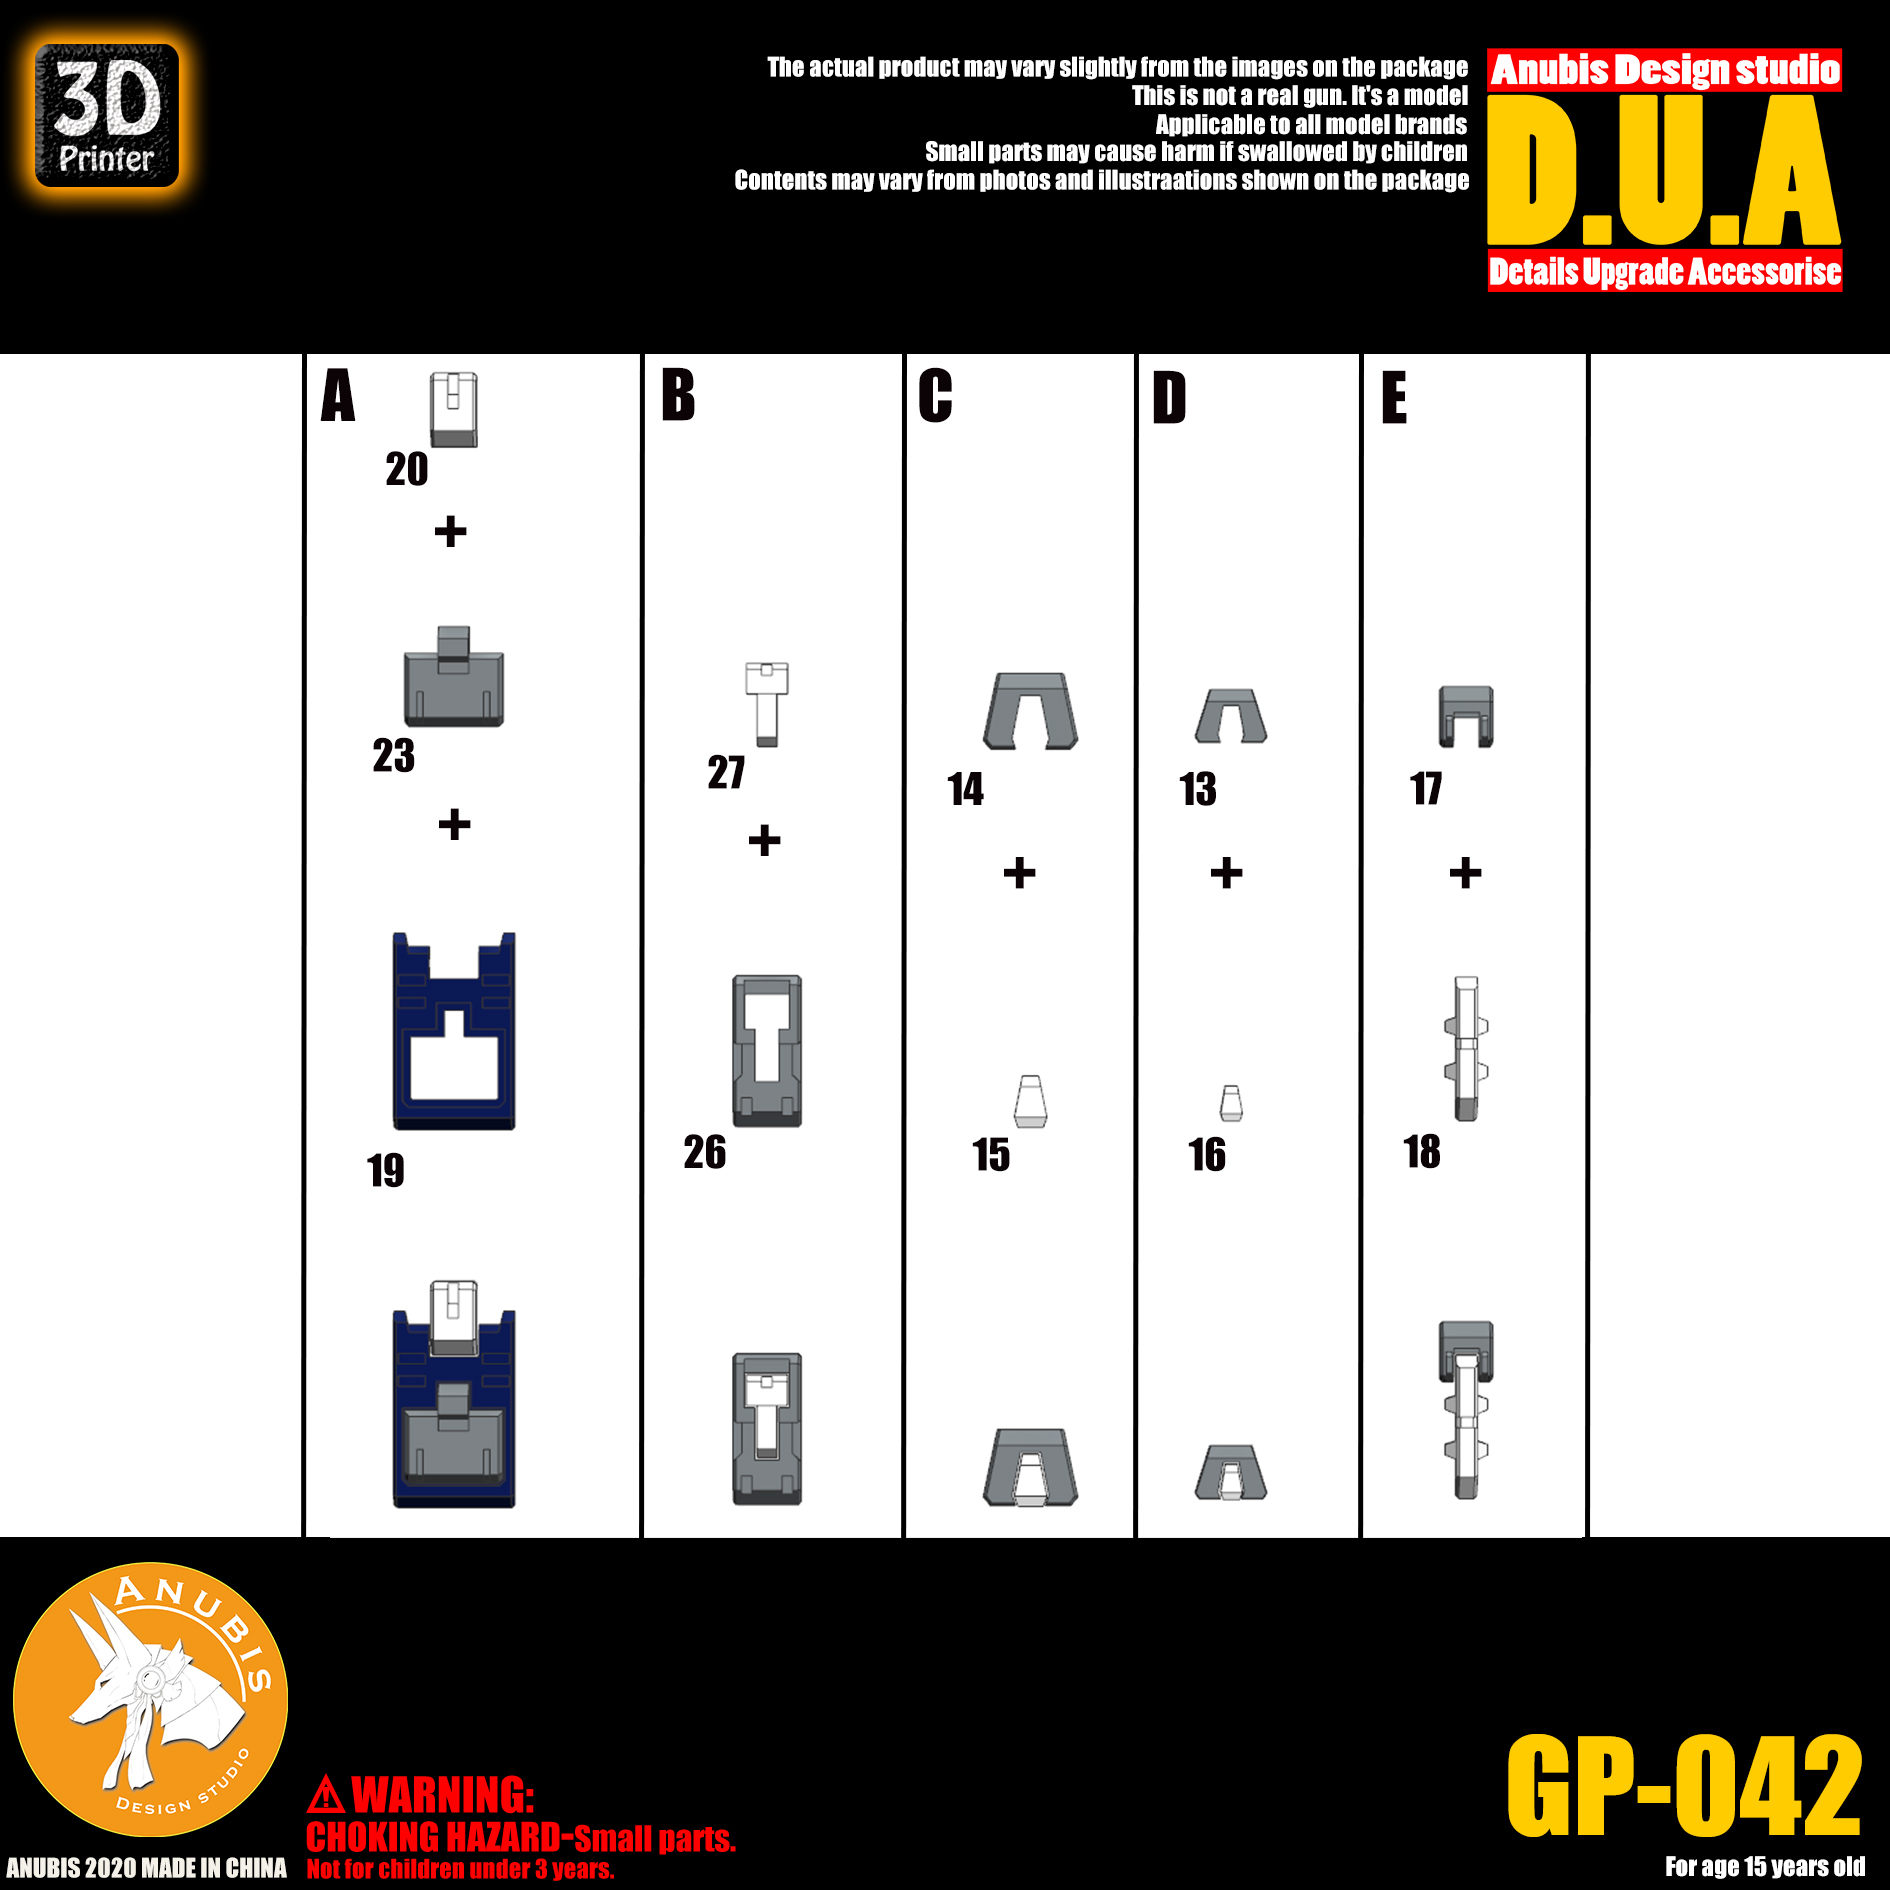 mw-gp-042-6.jpg